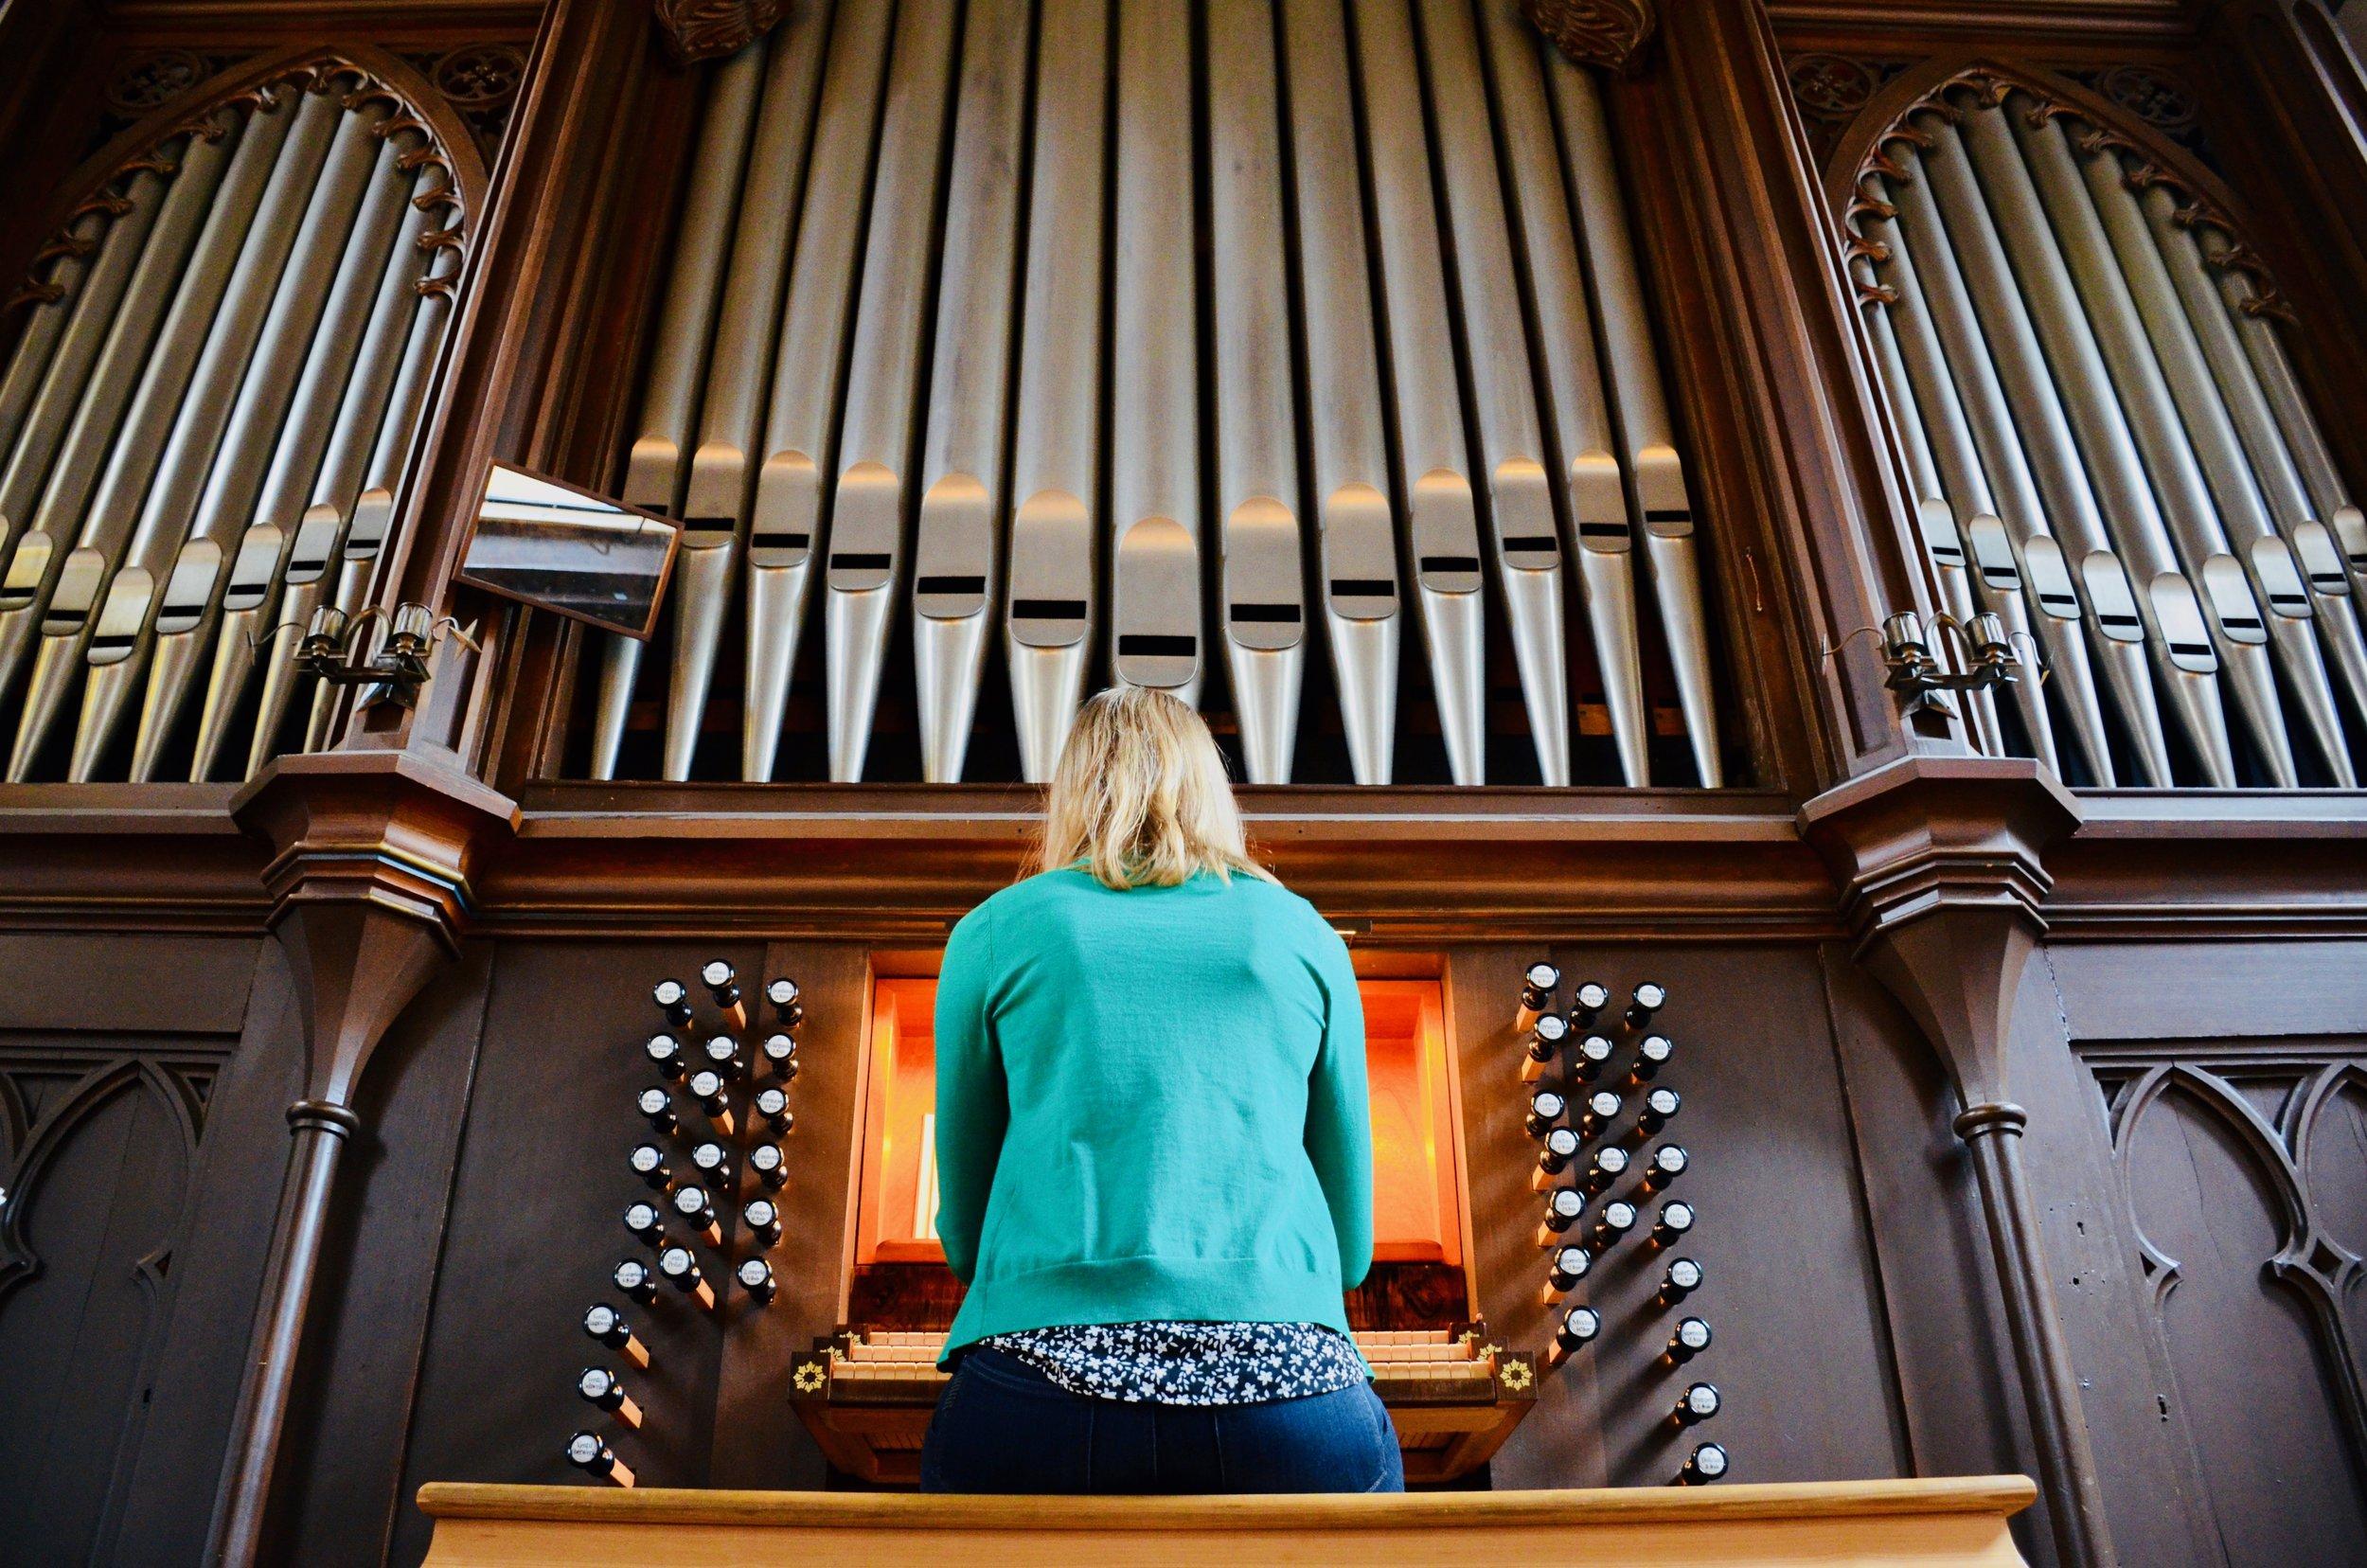 Laura Gullett plays the 1861 Marcussen & Søn organ in Haga Church, Göteborg, Sweden.